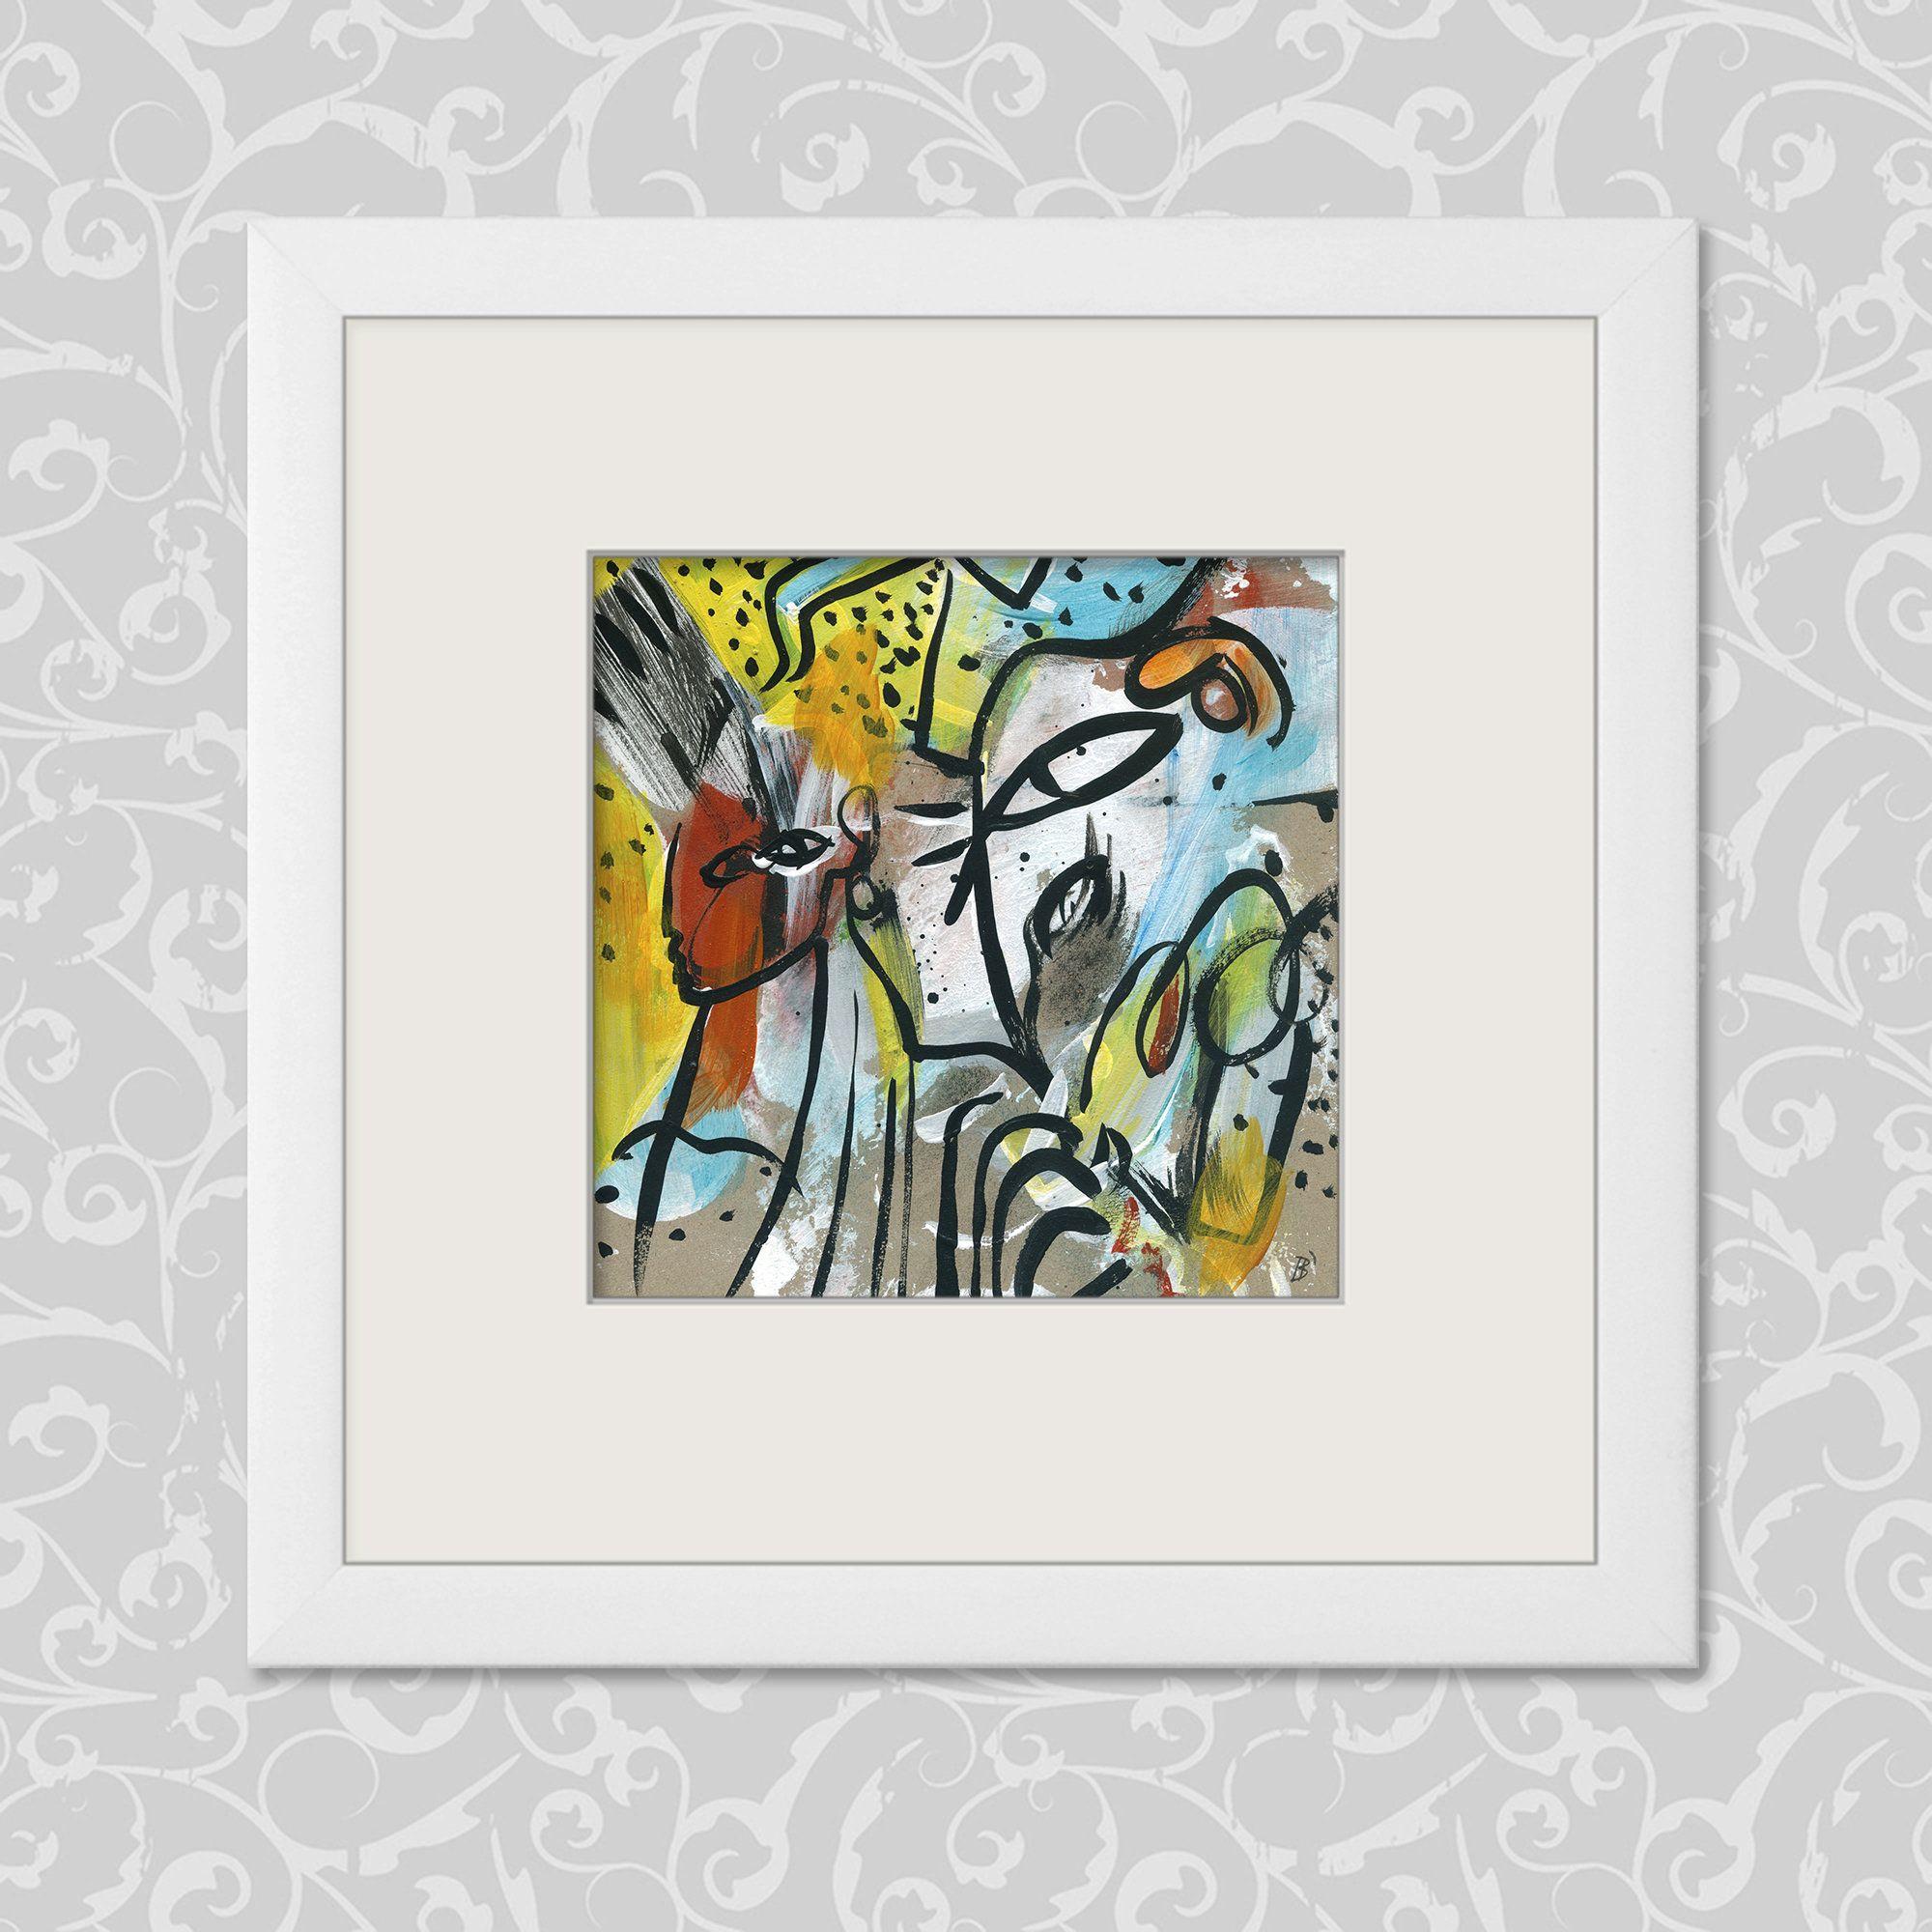 Malerei Original 20 20 Cm 7 87 7 87 Inch Kunst Abstract Painting Original Paintings Abstract